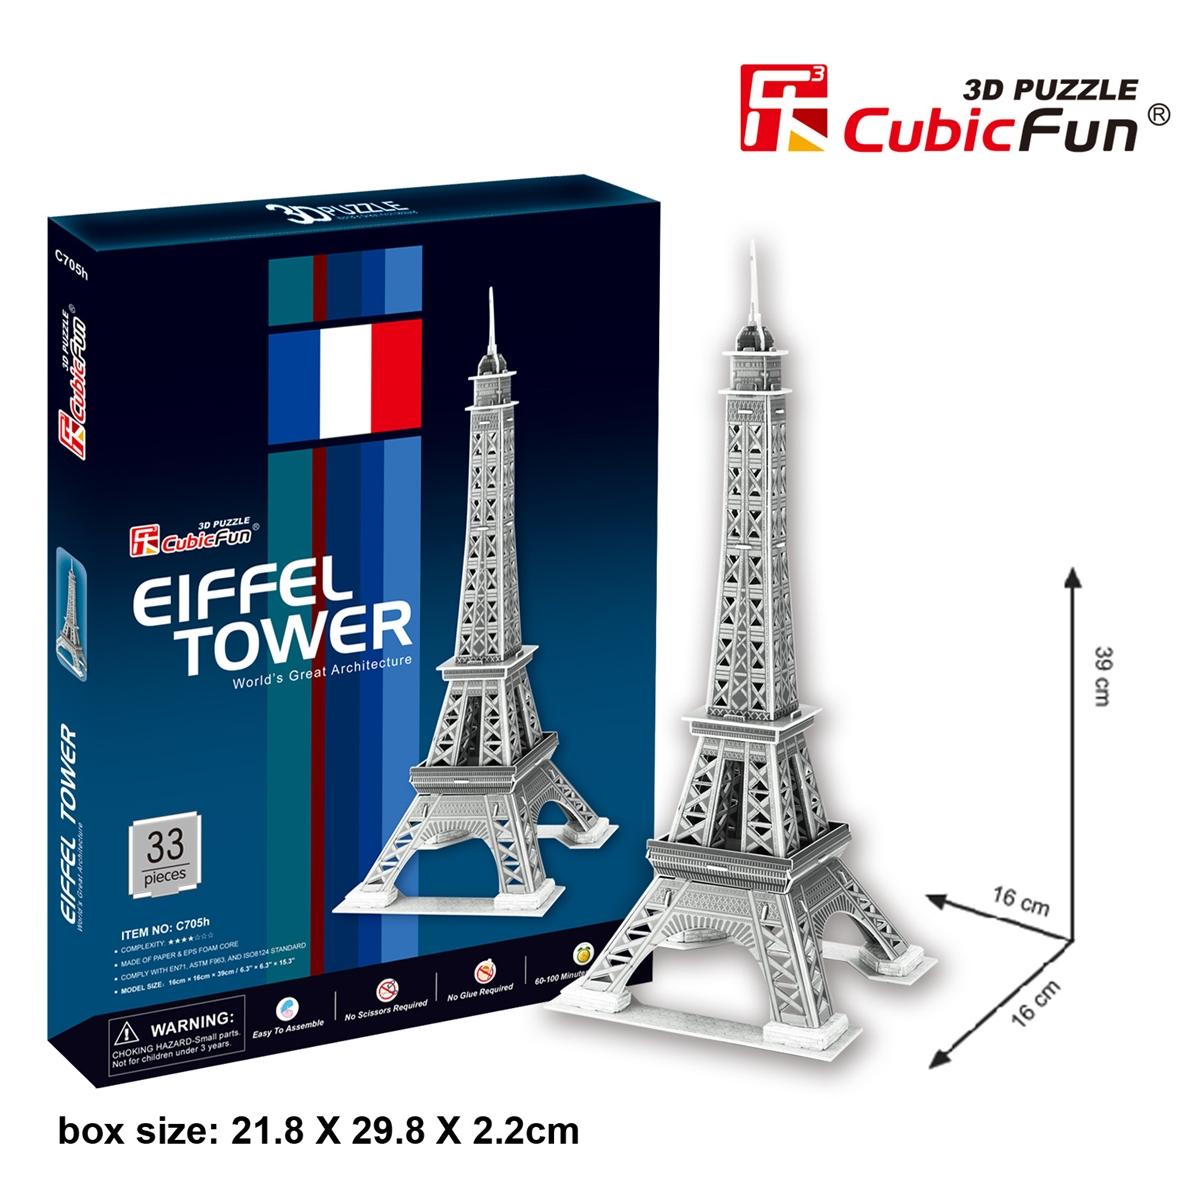 Eiffel Tower(France) หอไอเฟล Total: 33 pcs Model Size: 16*16*39 cm